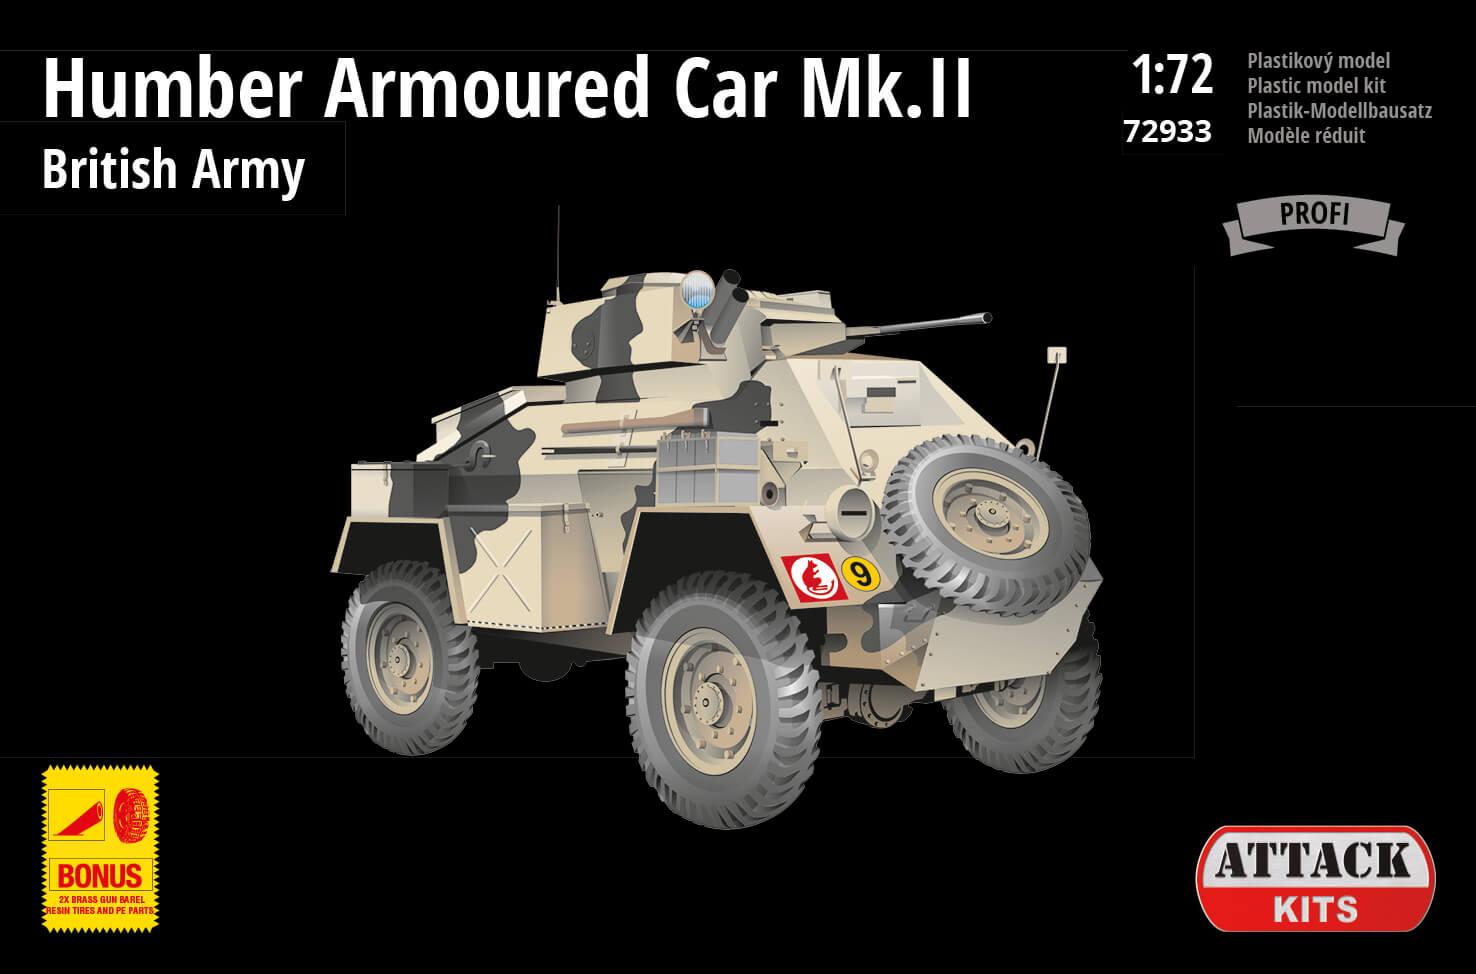 Attack Kits - 72933 - Humber Armoured Car Mk.II – British Army Africa 1:72